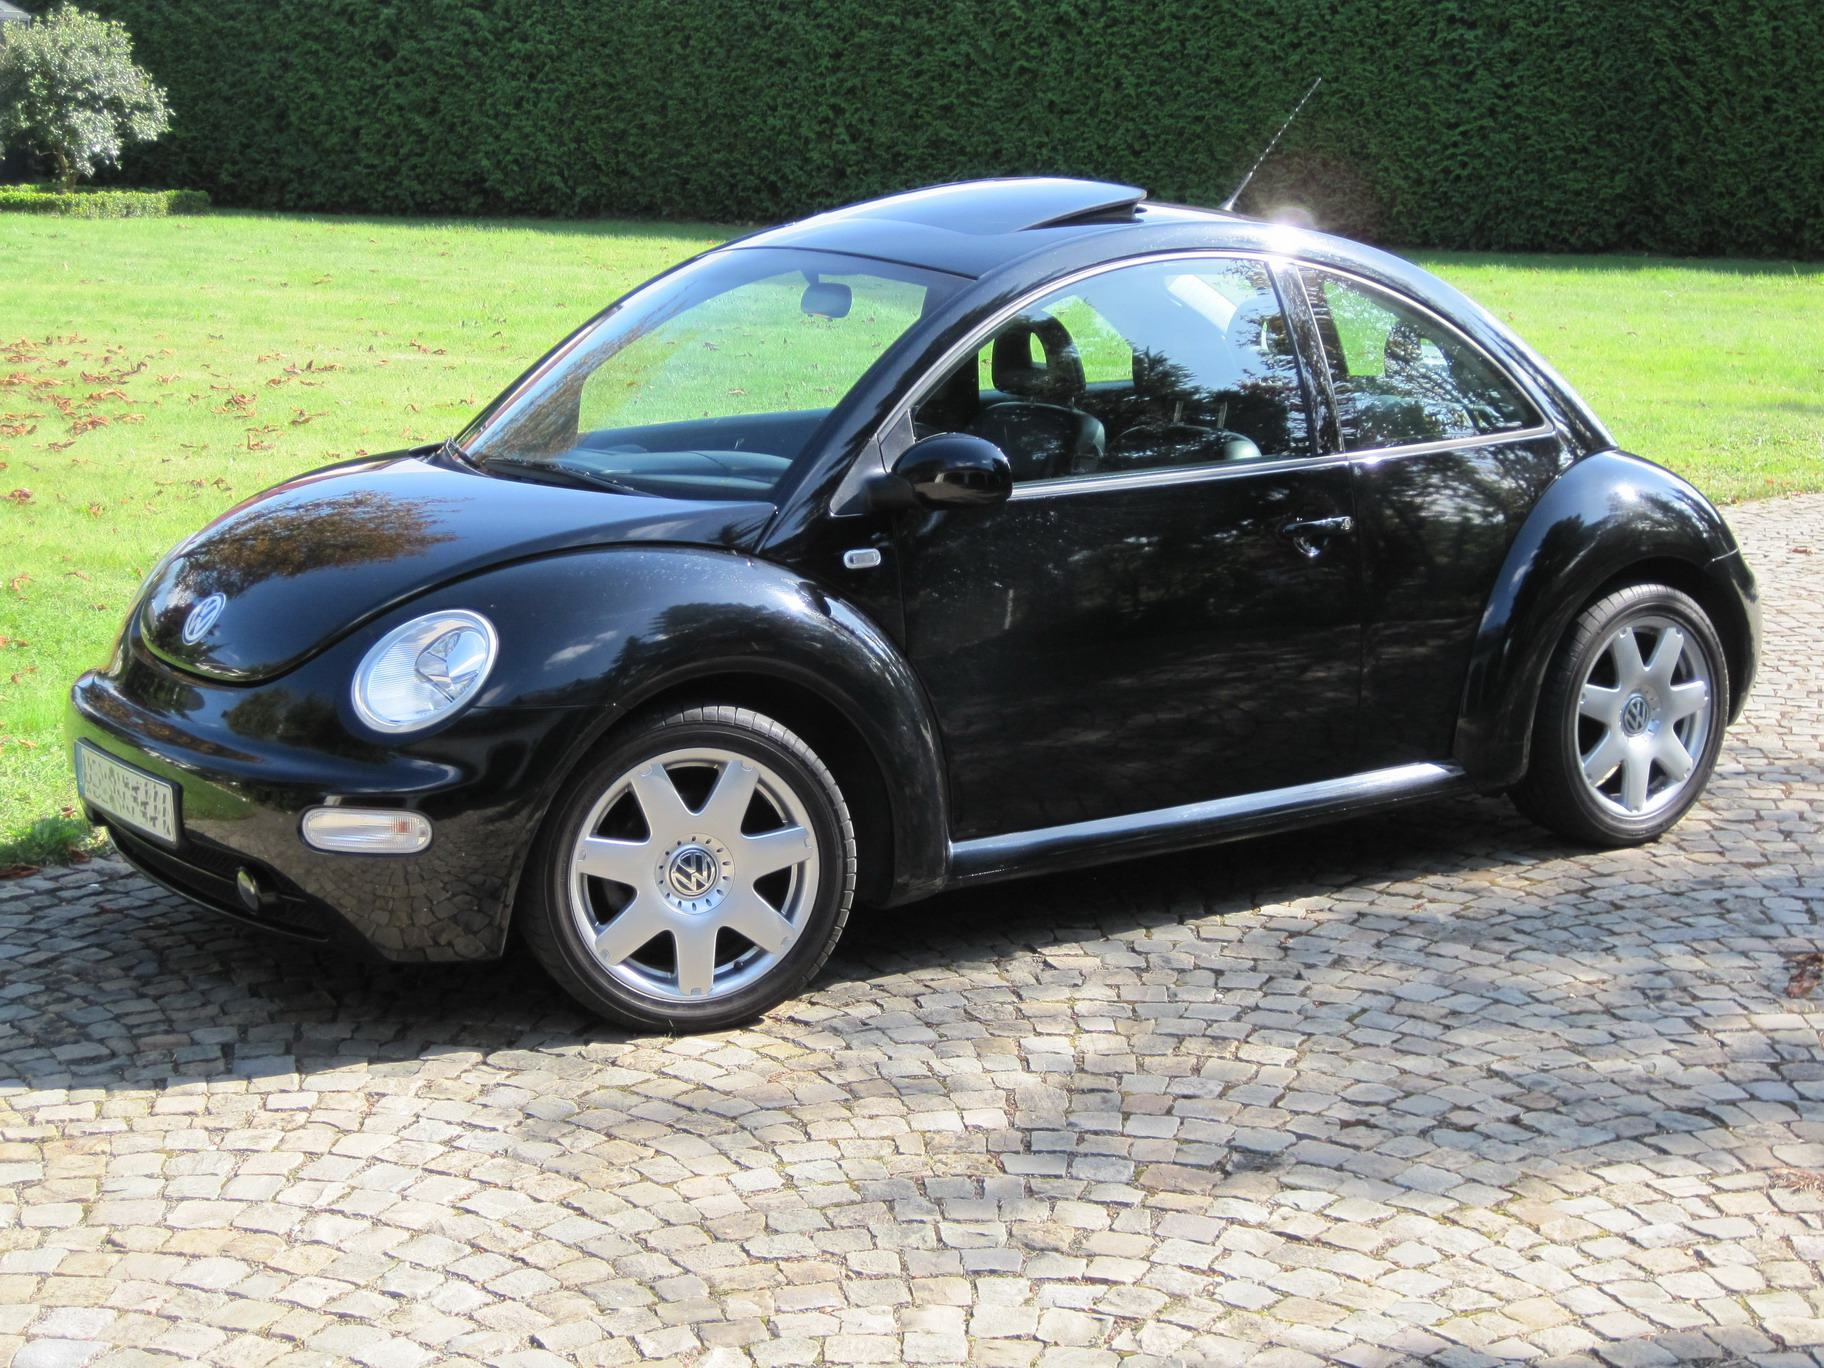 biete vw new beetle 2 0 leder schiebedach 17 daytona biete pkw zubeh r. Black Bedroom Furniture Sets. Home Design Ideas